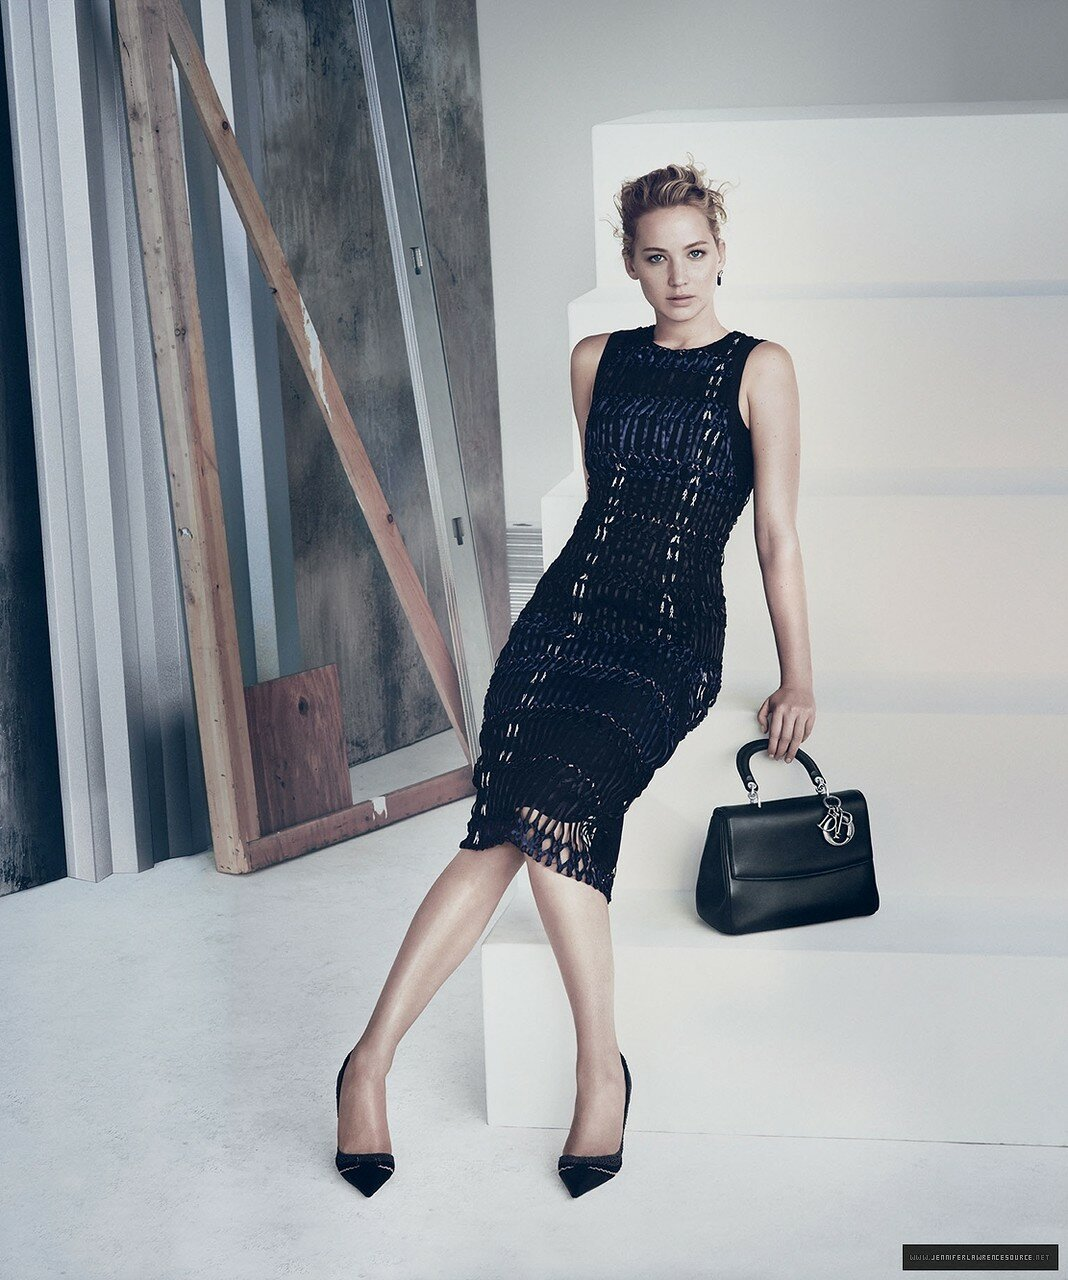 Фото актрисы Дженнифер Лоуренс (Jennifer Lawrence) для рекламной кампании линии сумок Dior сезона весна–лето 2015